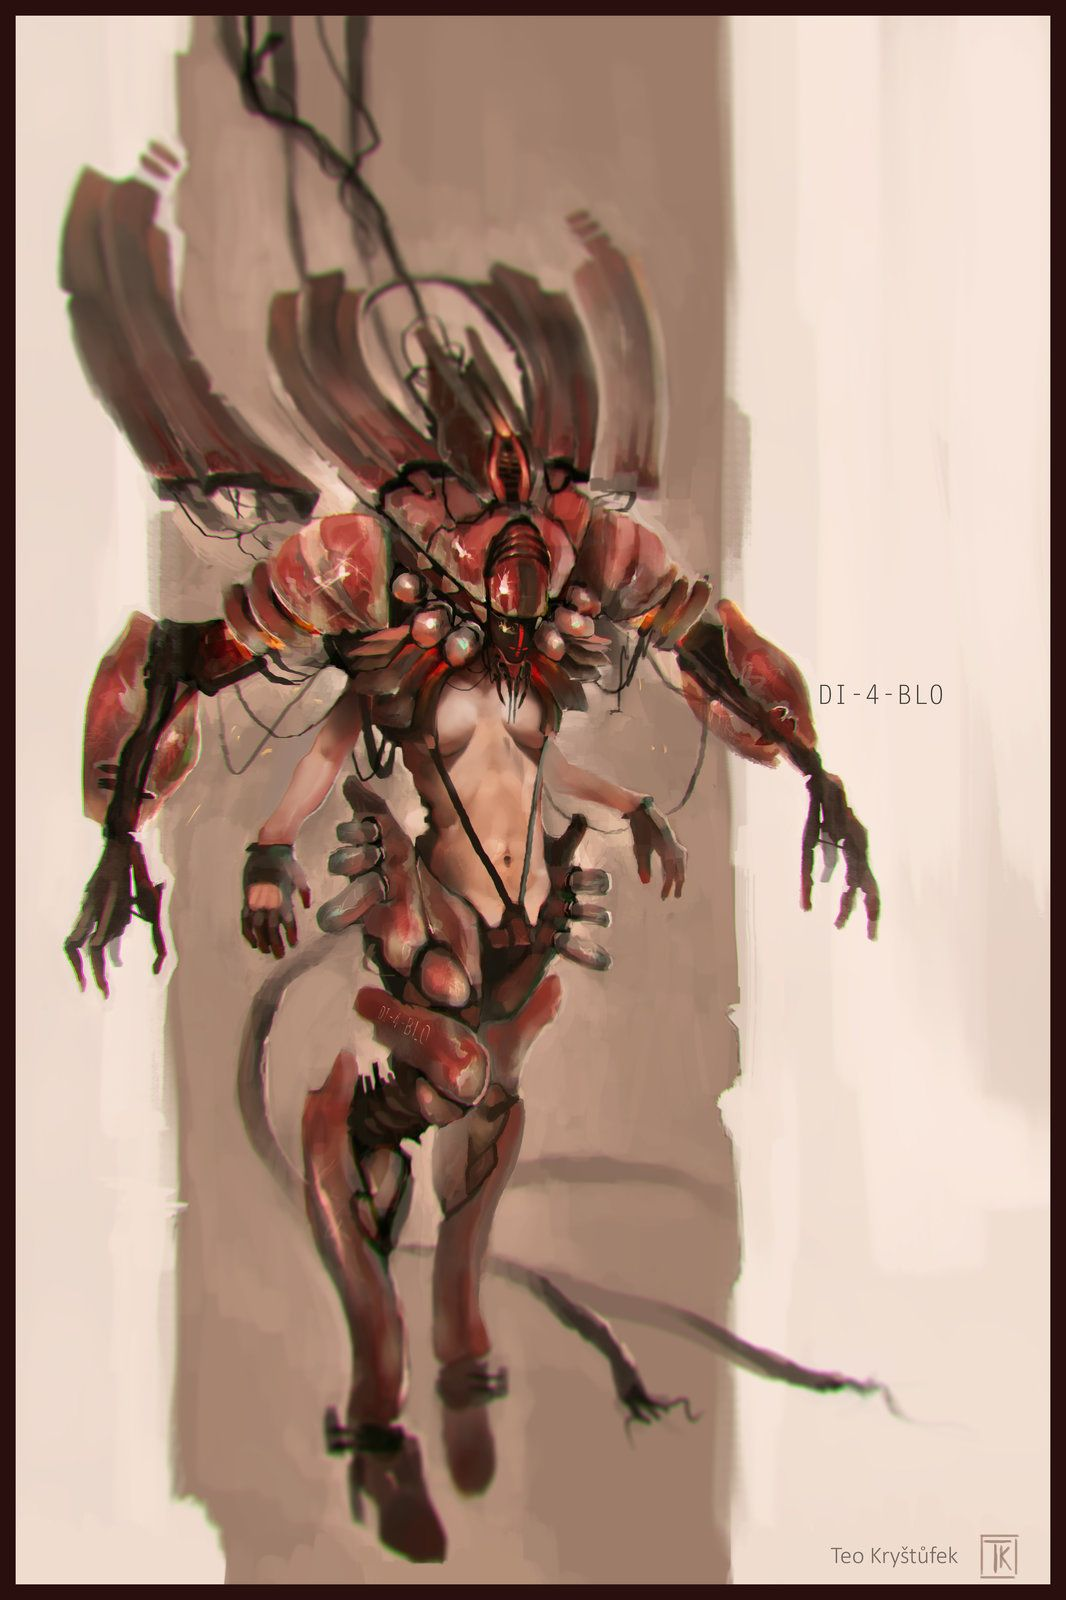 Diablo redesign, Teo Kryštůfek on ArtStation at https://www.artstation.com/artwork/diablo-redesign-1b3304c2-384c-4ae1-86af-bfb315f06ea4